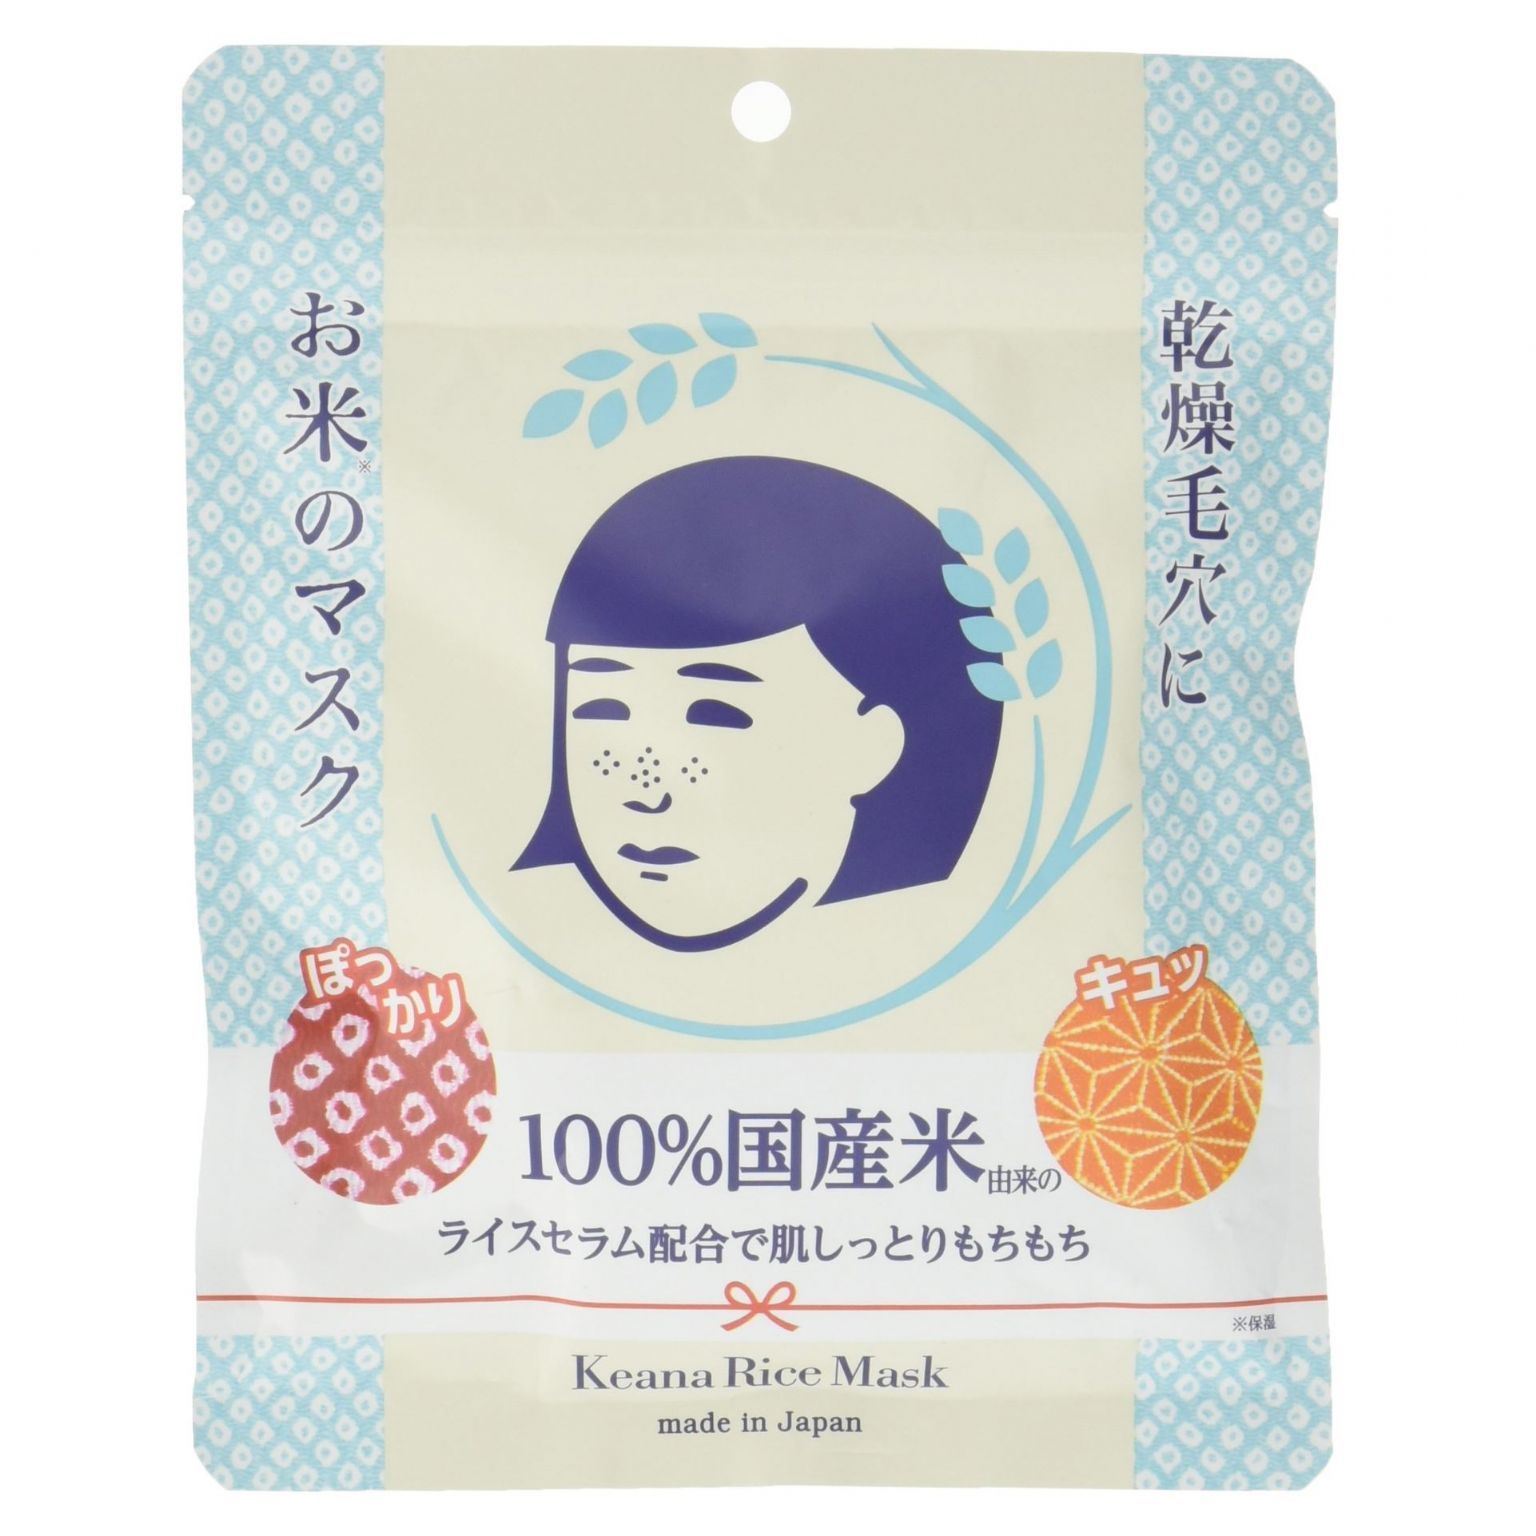 Rice Mask